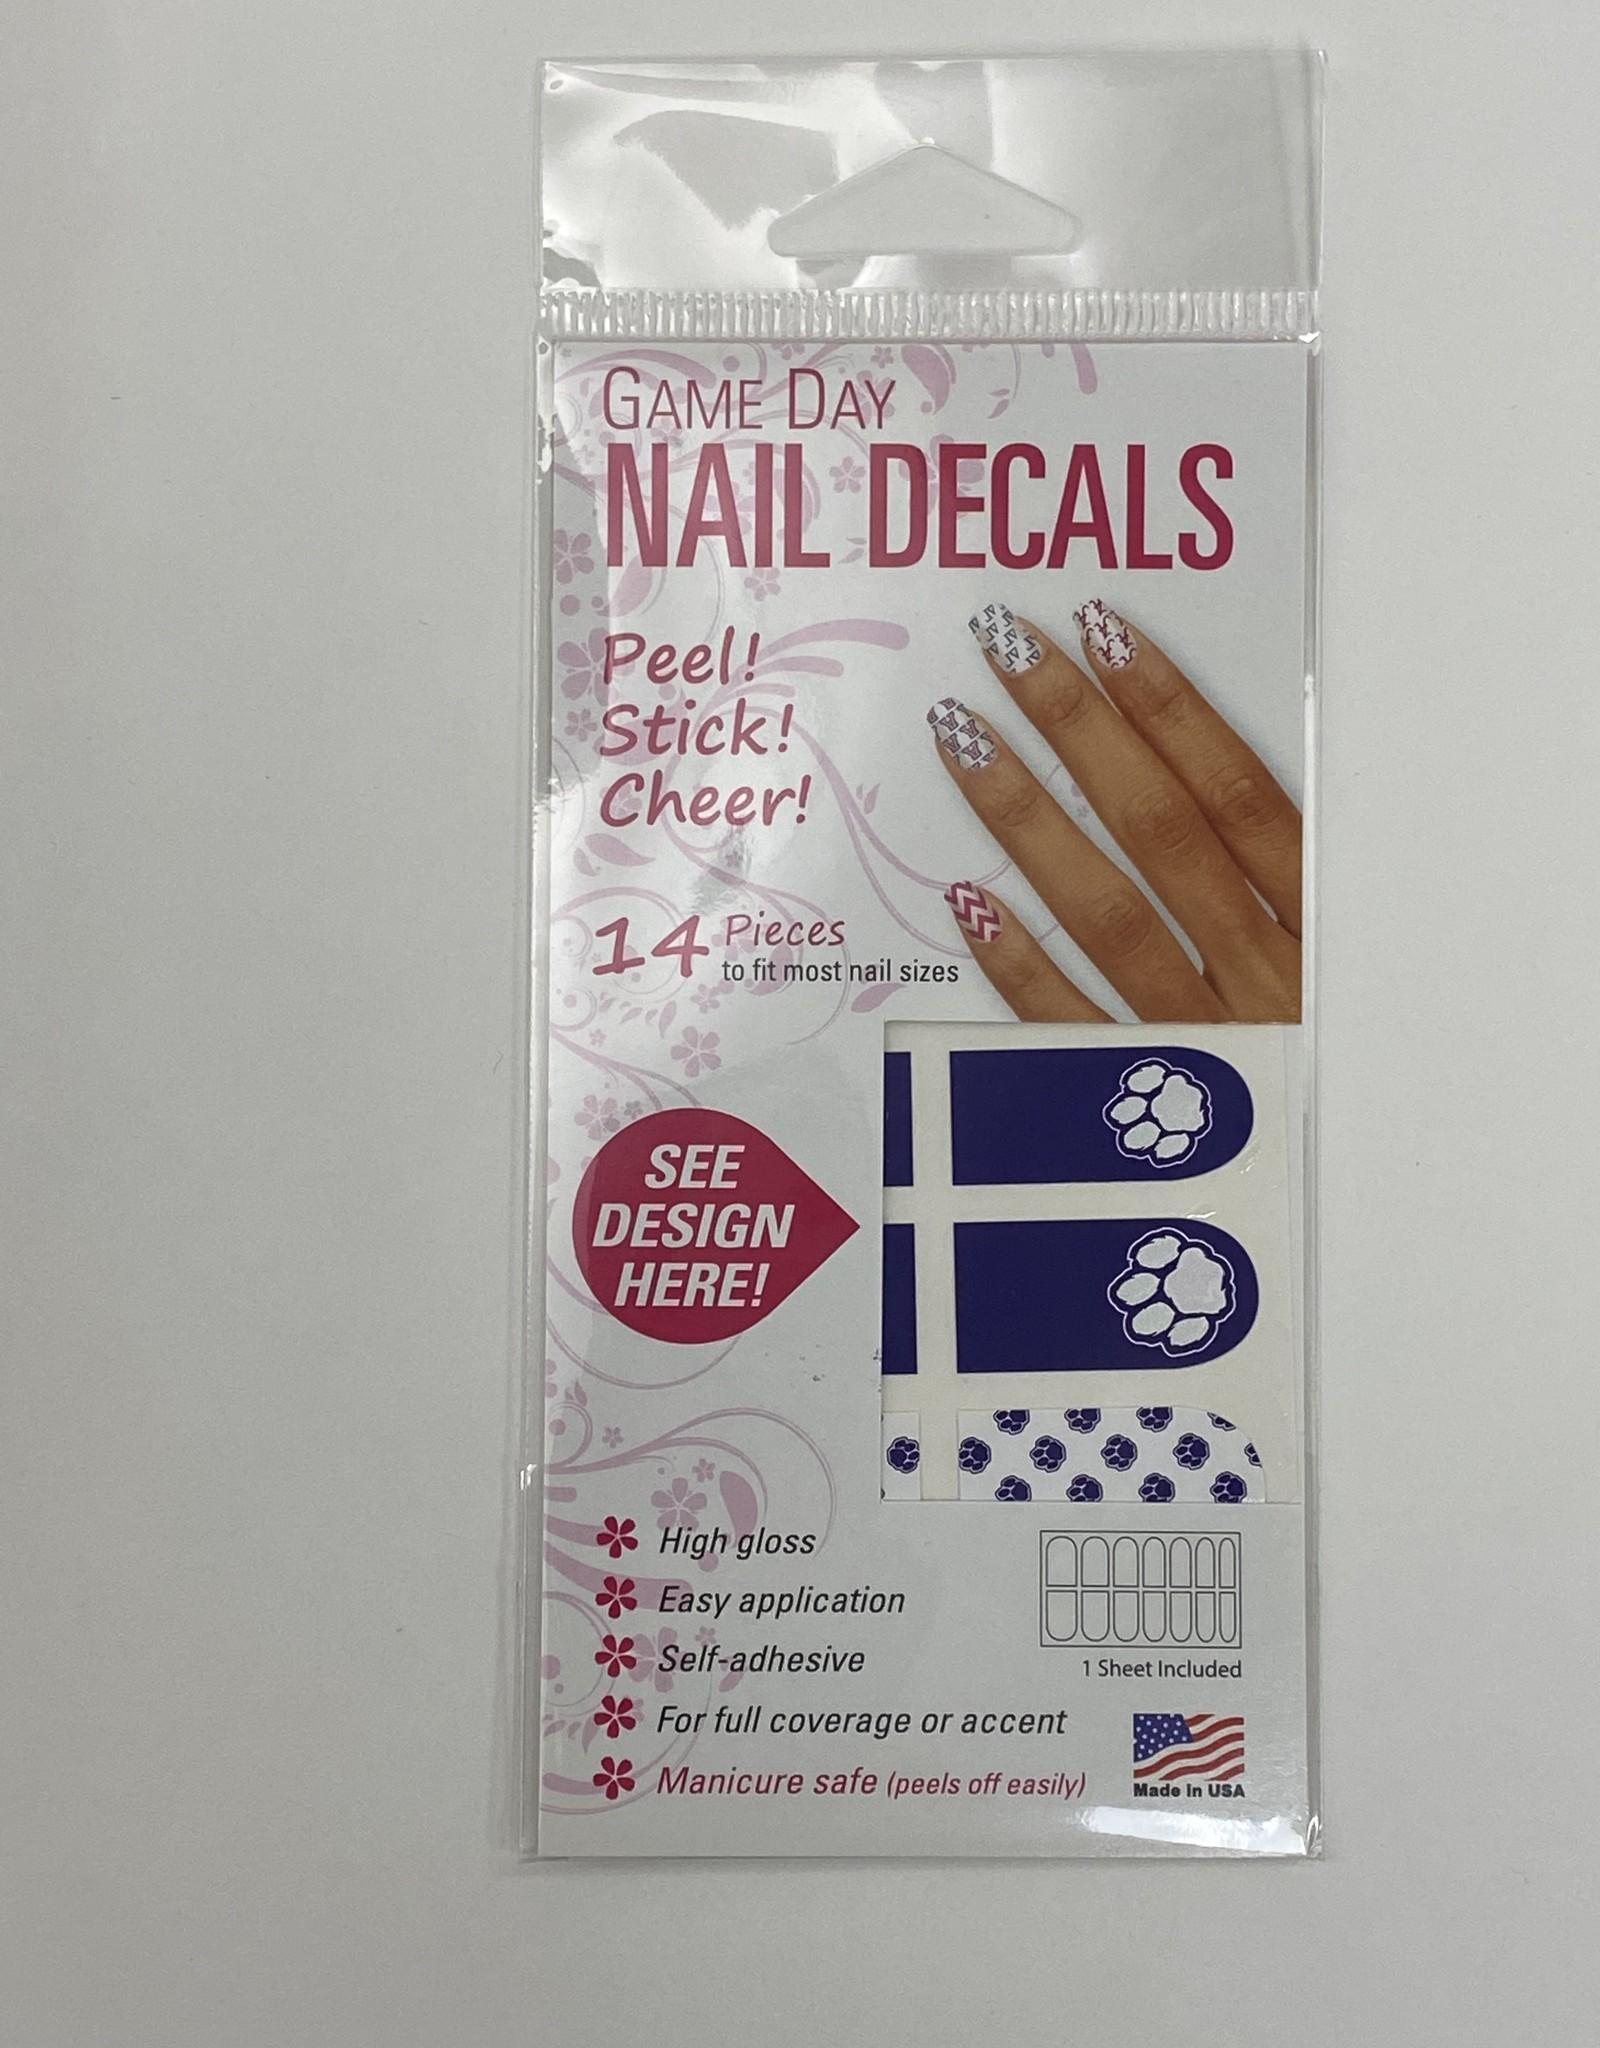 Eyeblack Nail Decals